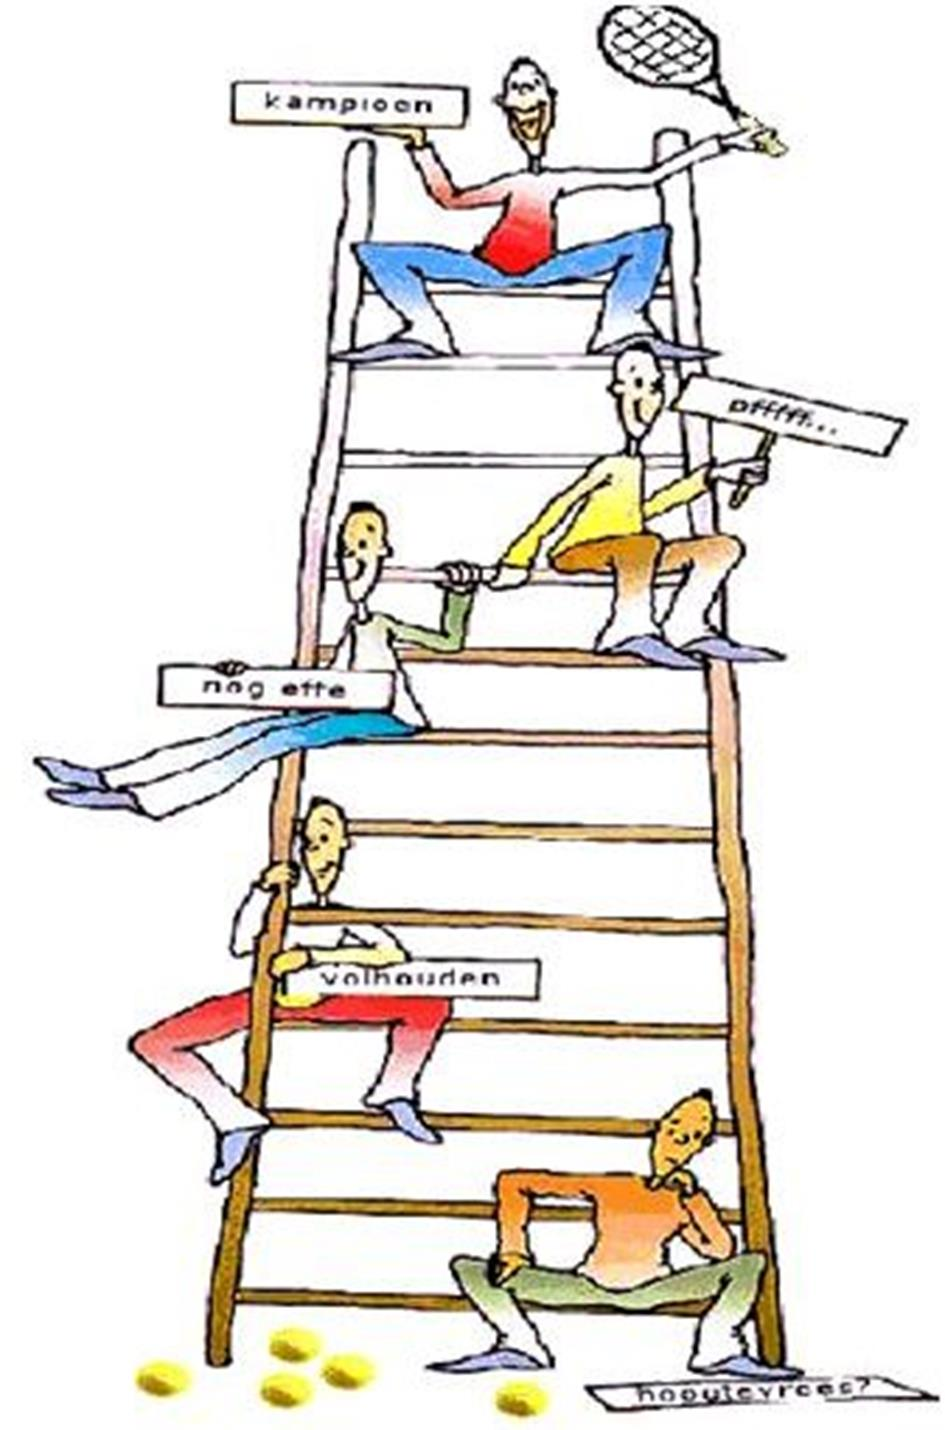 ladder-afbeelding-2016.jpg